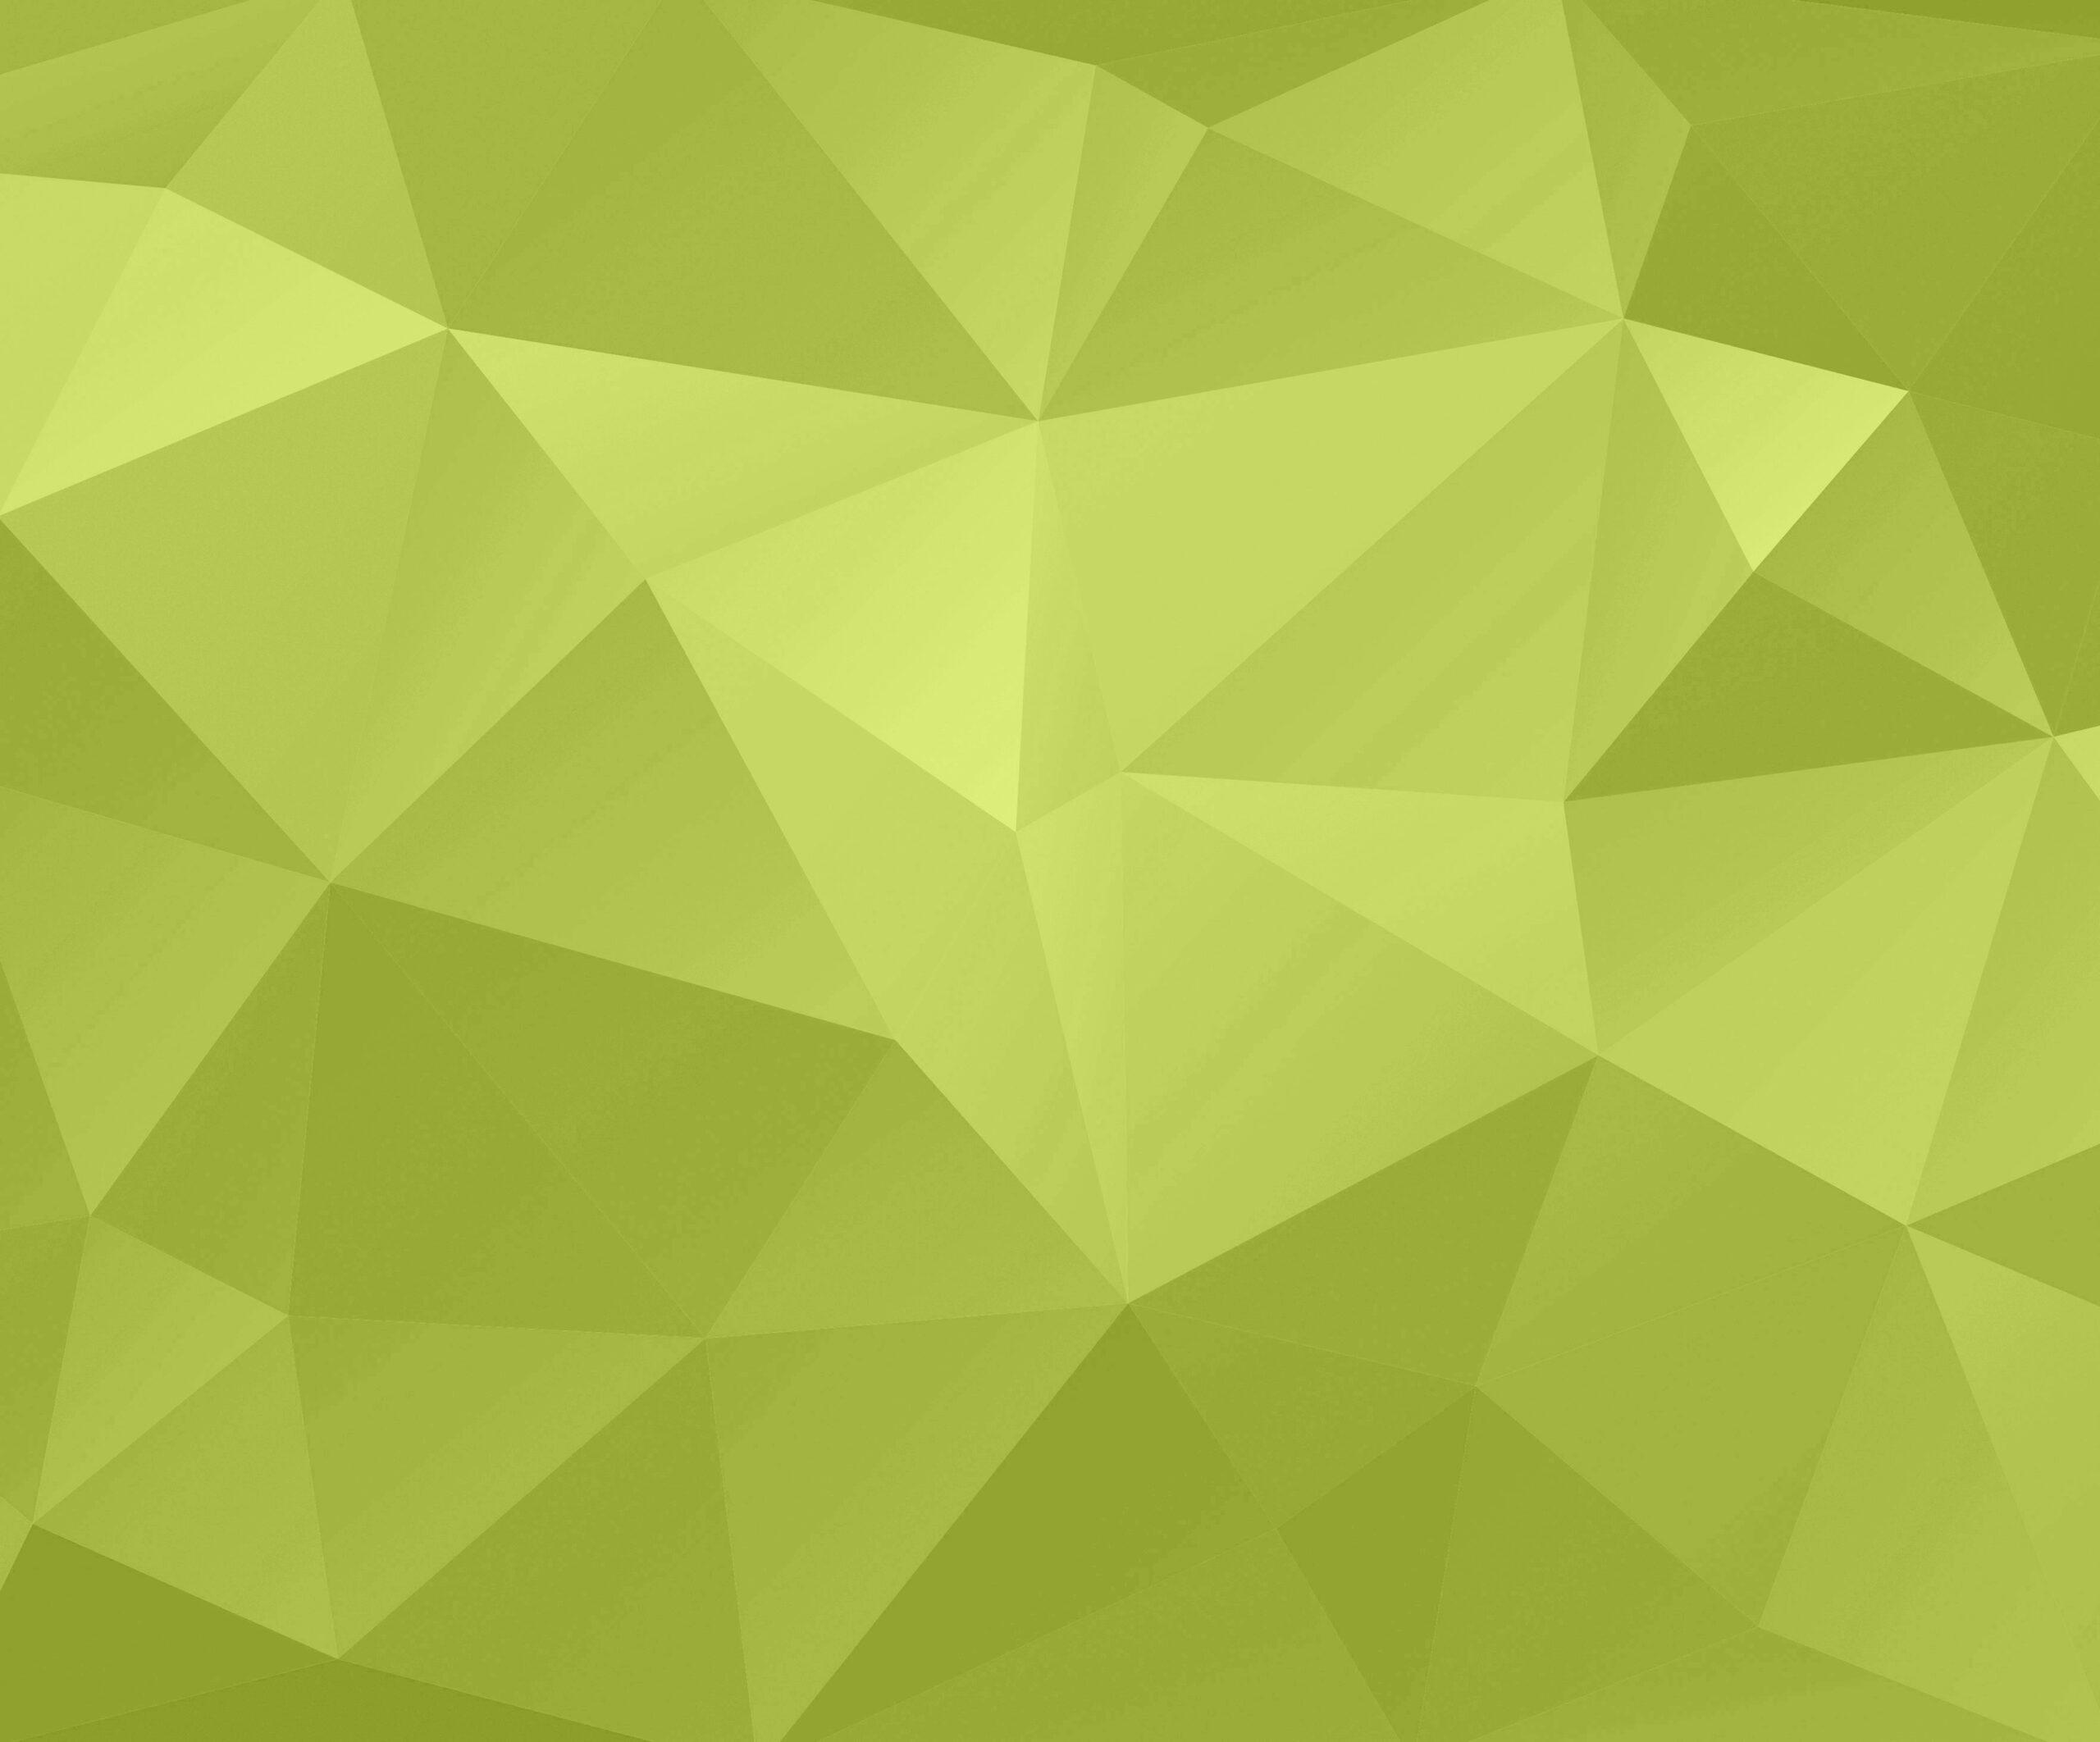 soybean_prismtexture